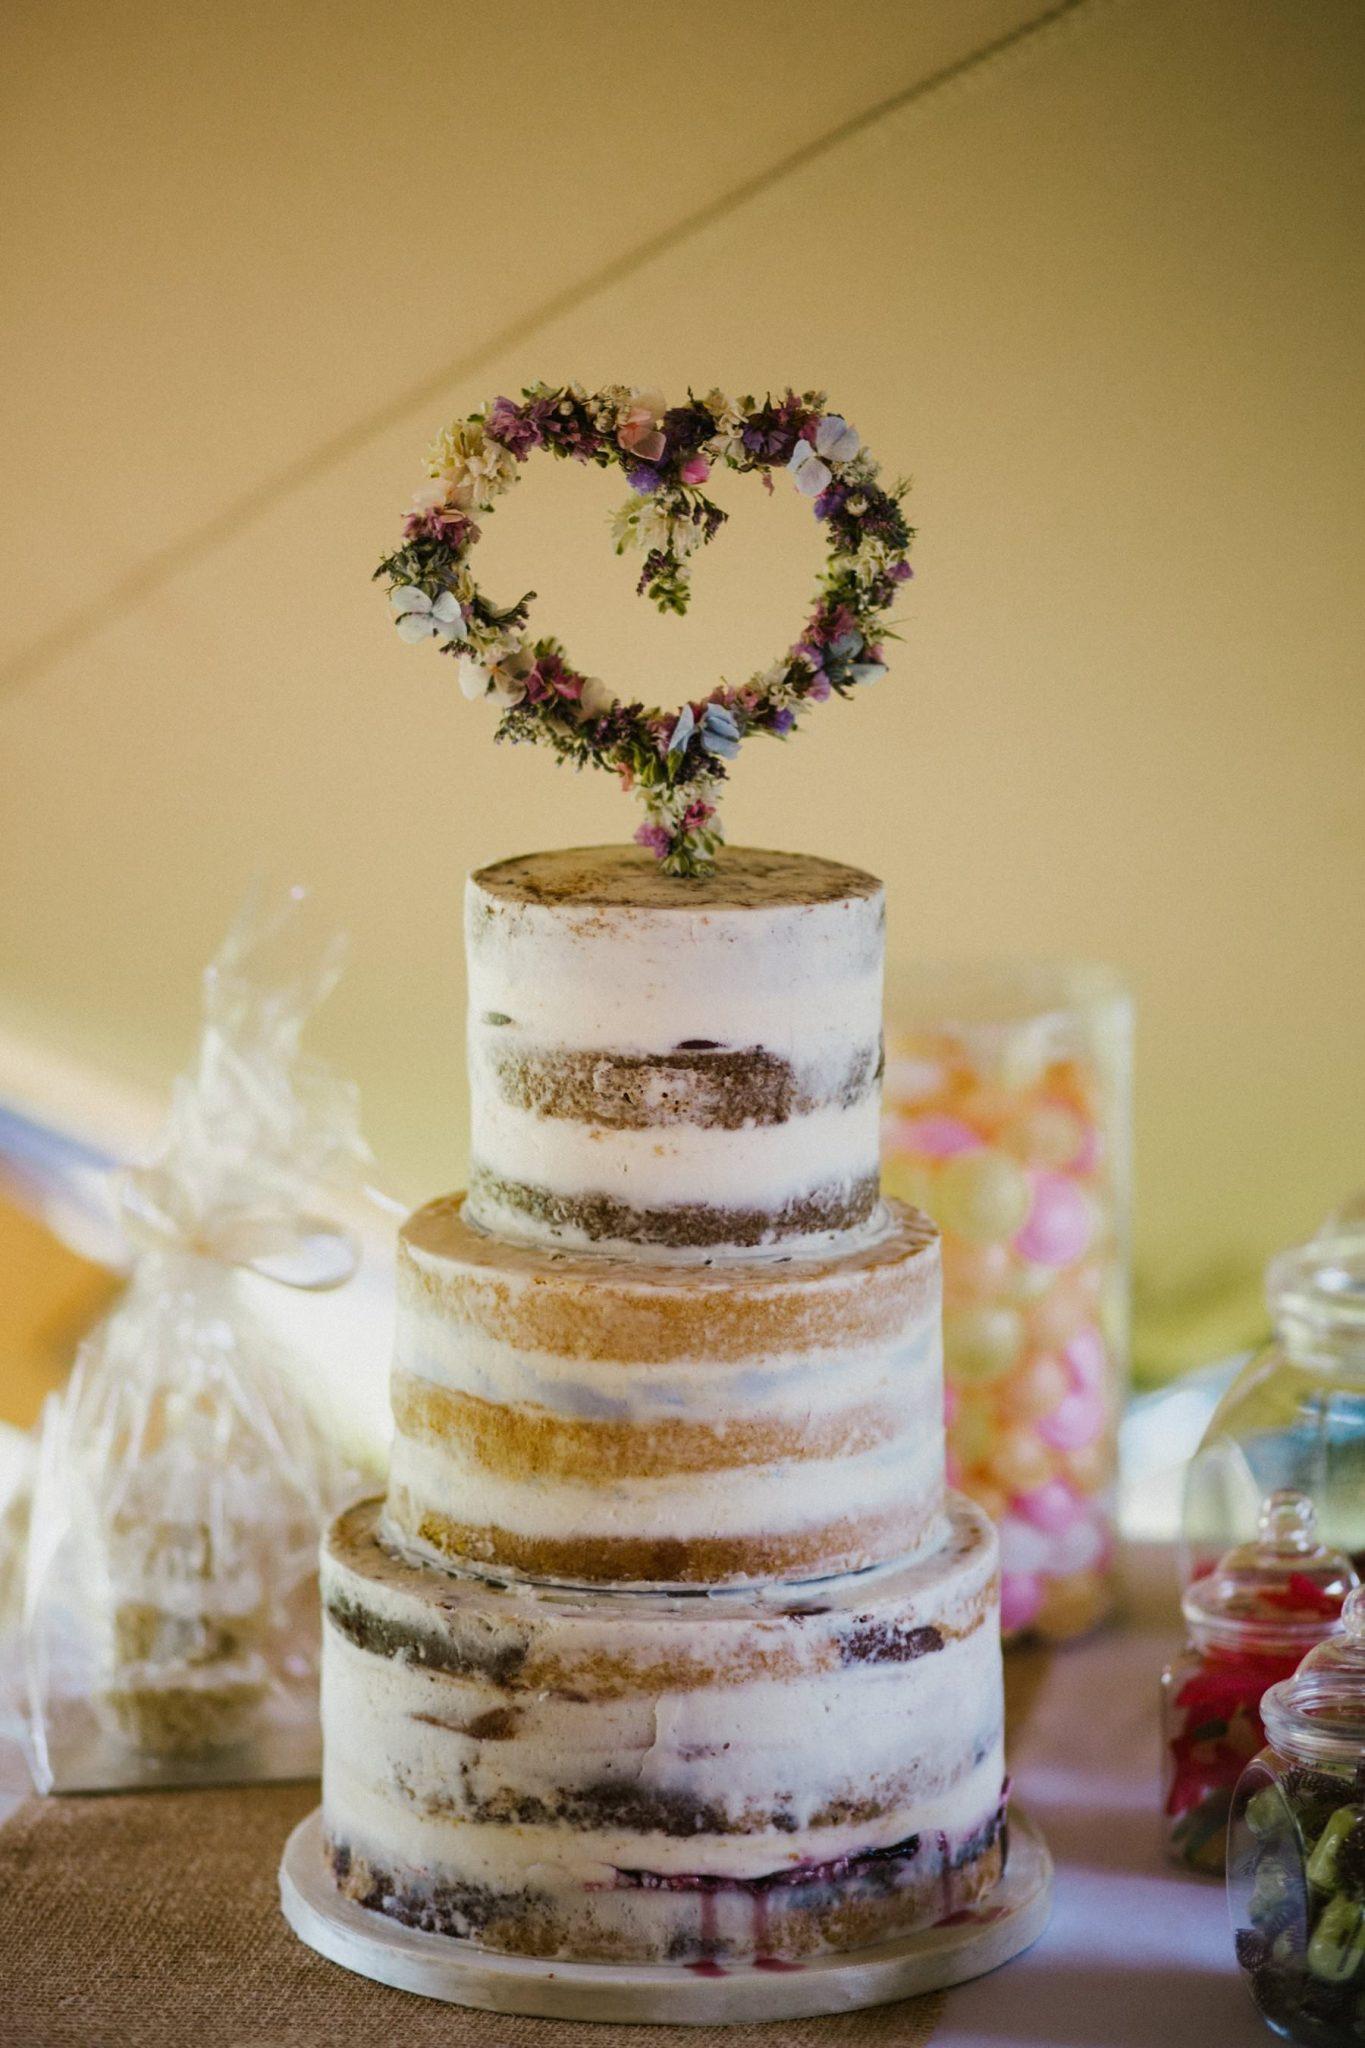 naked wedding cake in northern ireland